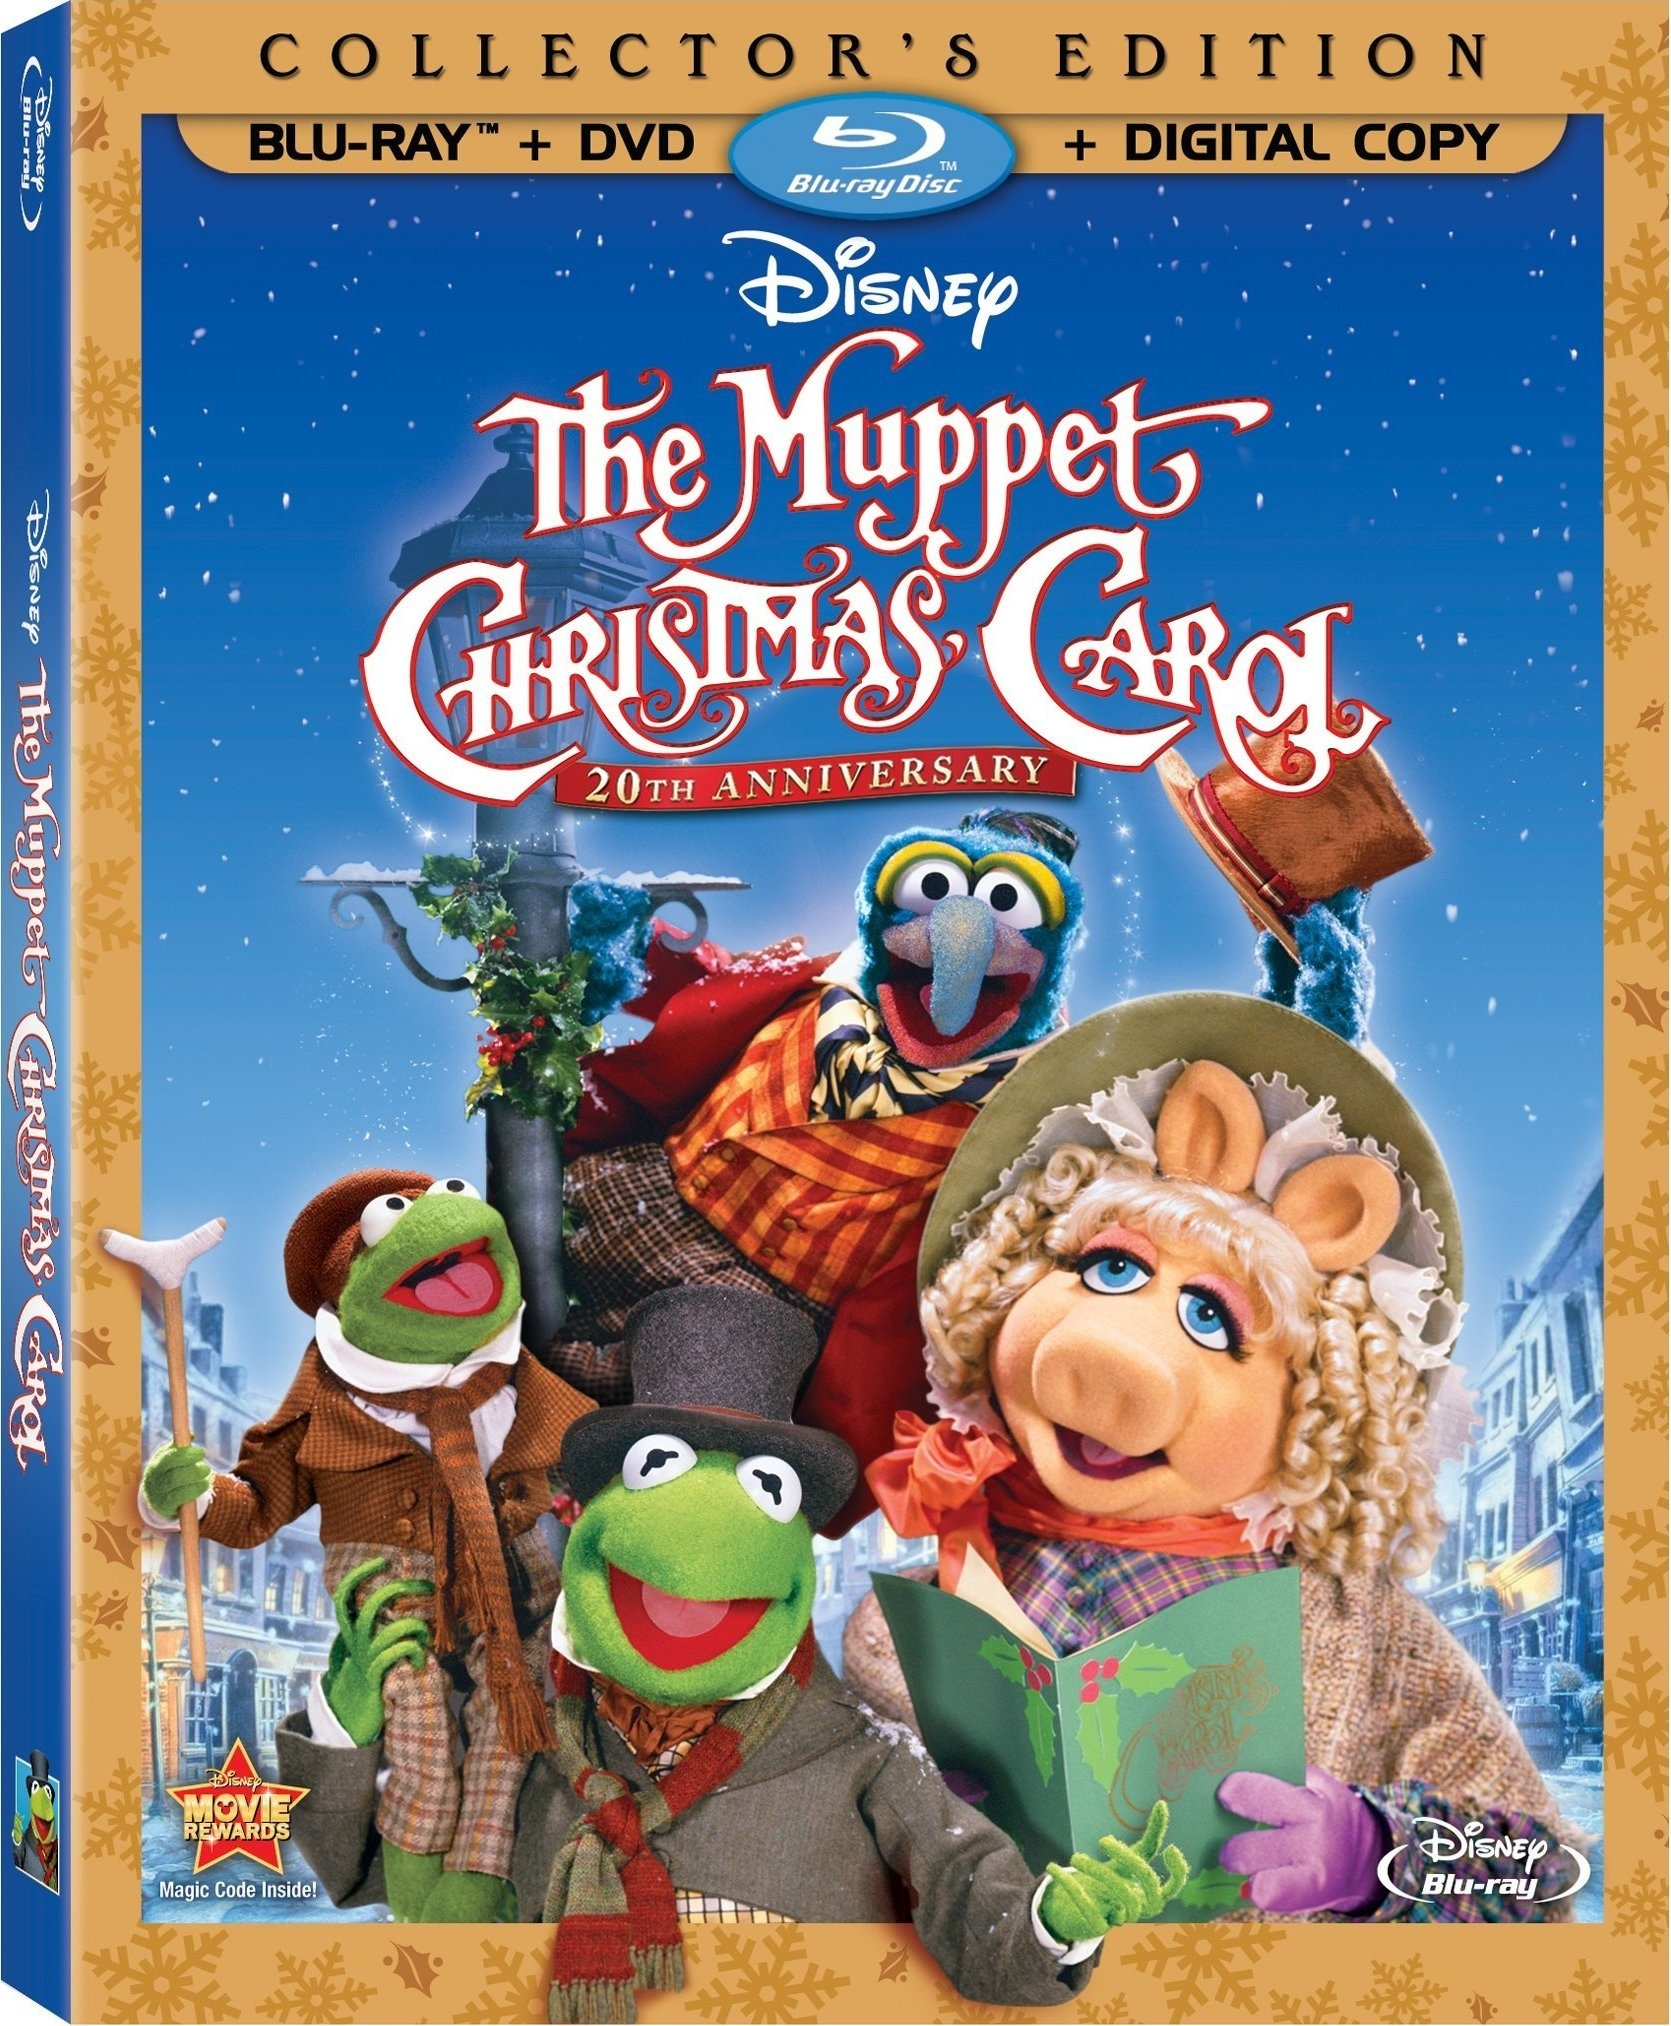 The Muppet Chrismas Carol